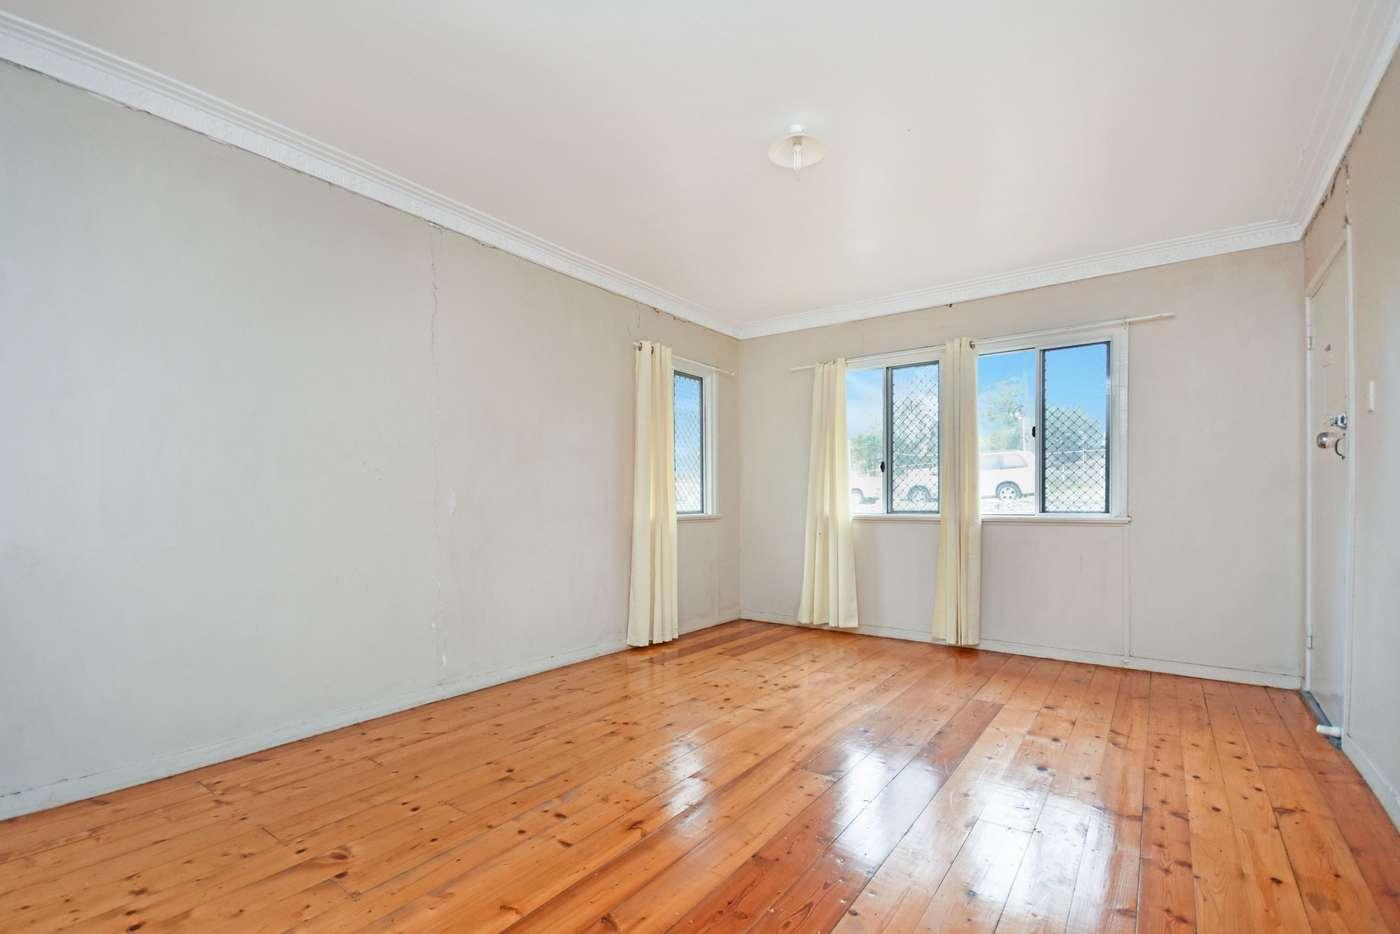 Sixth view of Homely house listing, 14 Mumford Road, Narangba QLD 4504